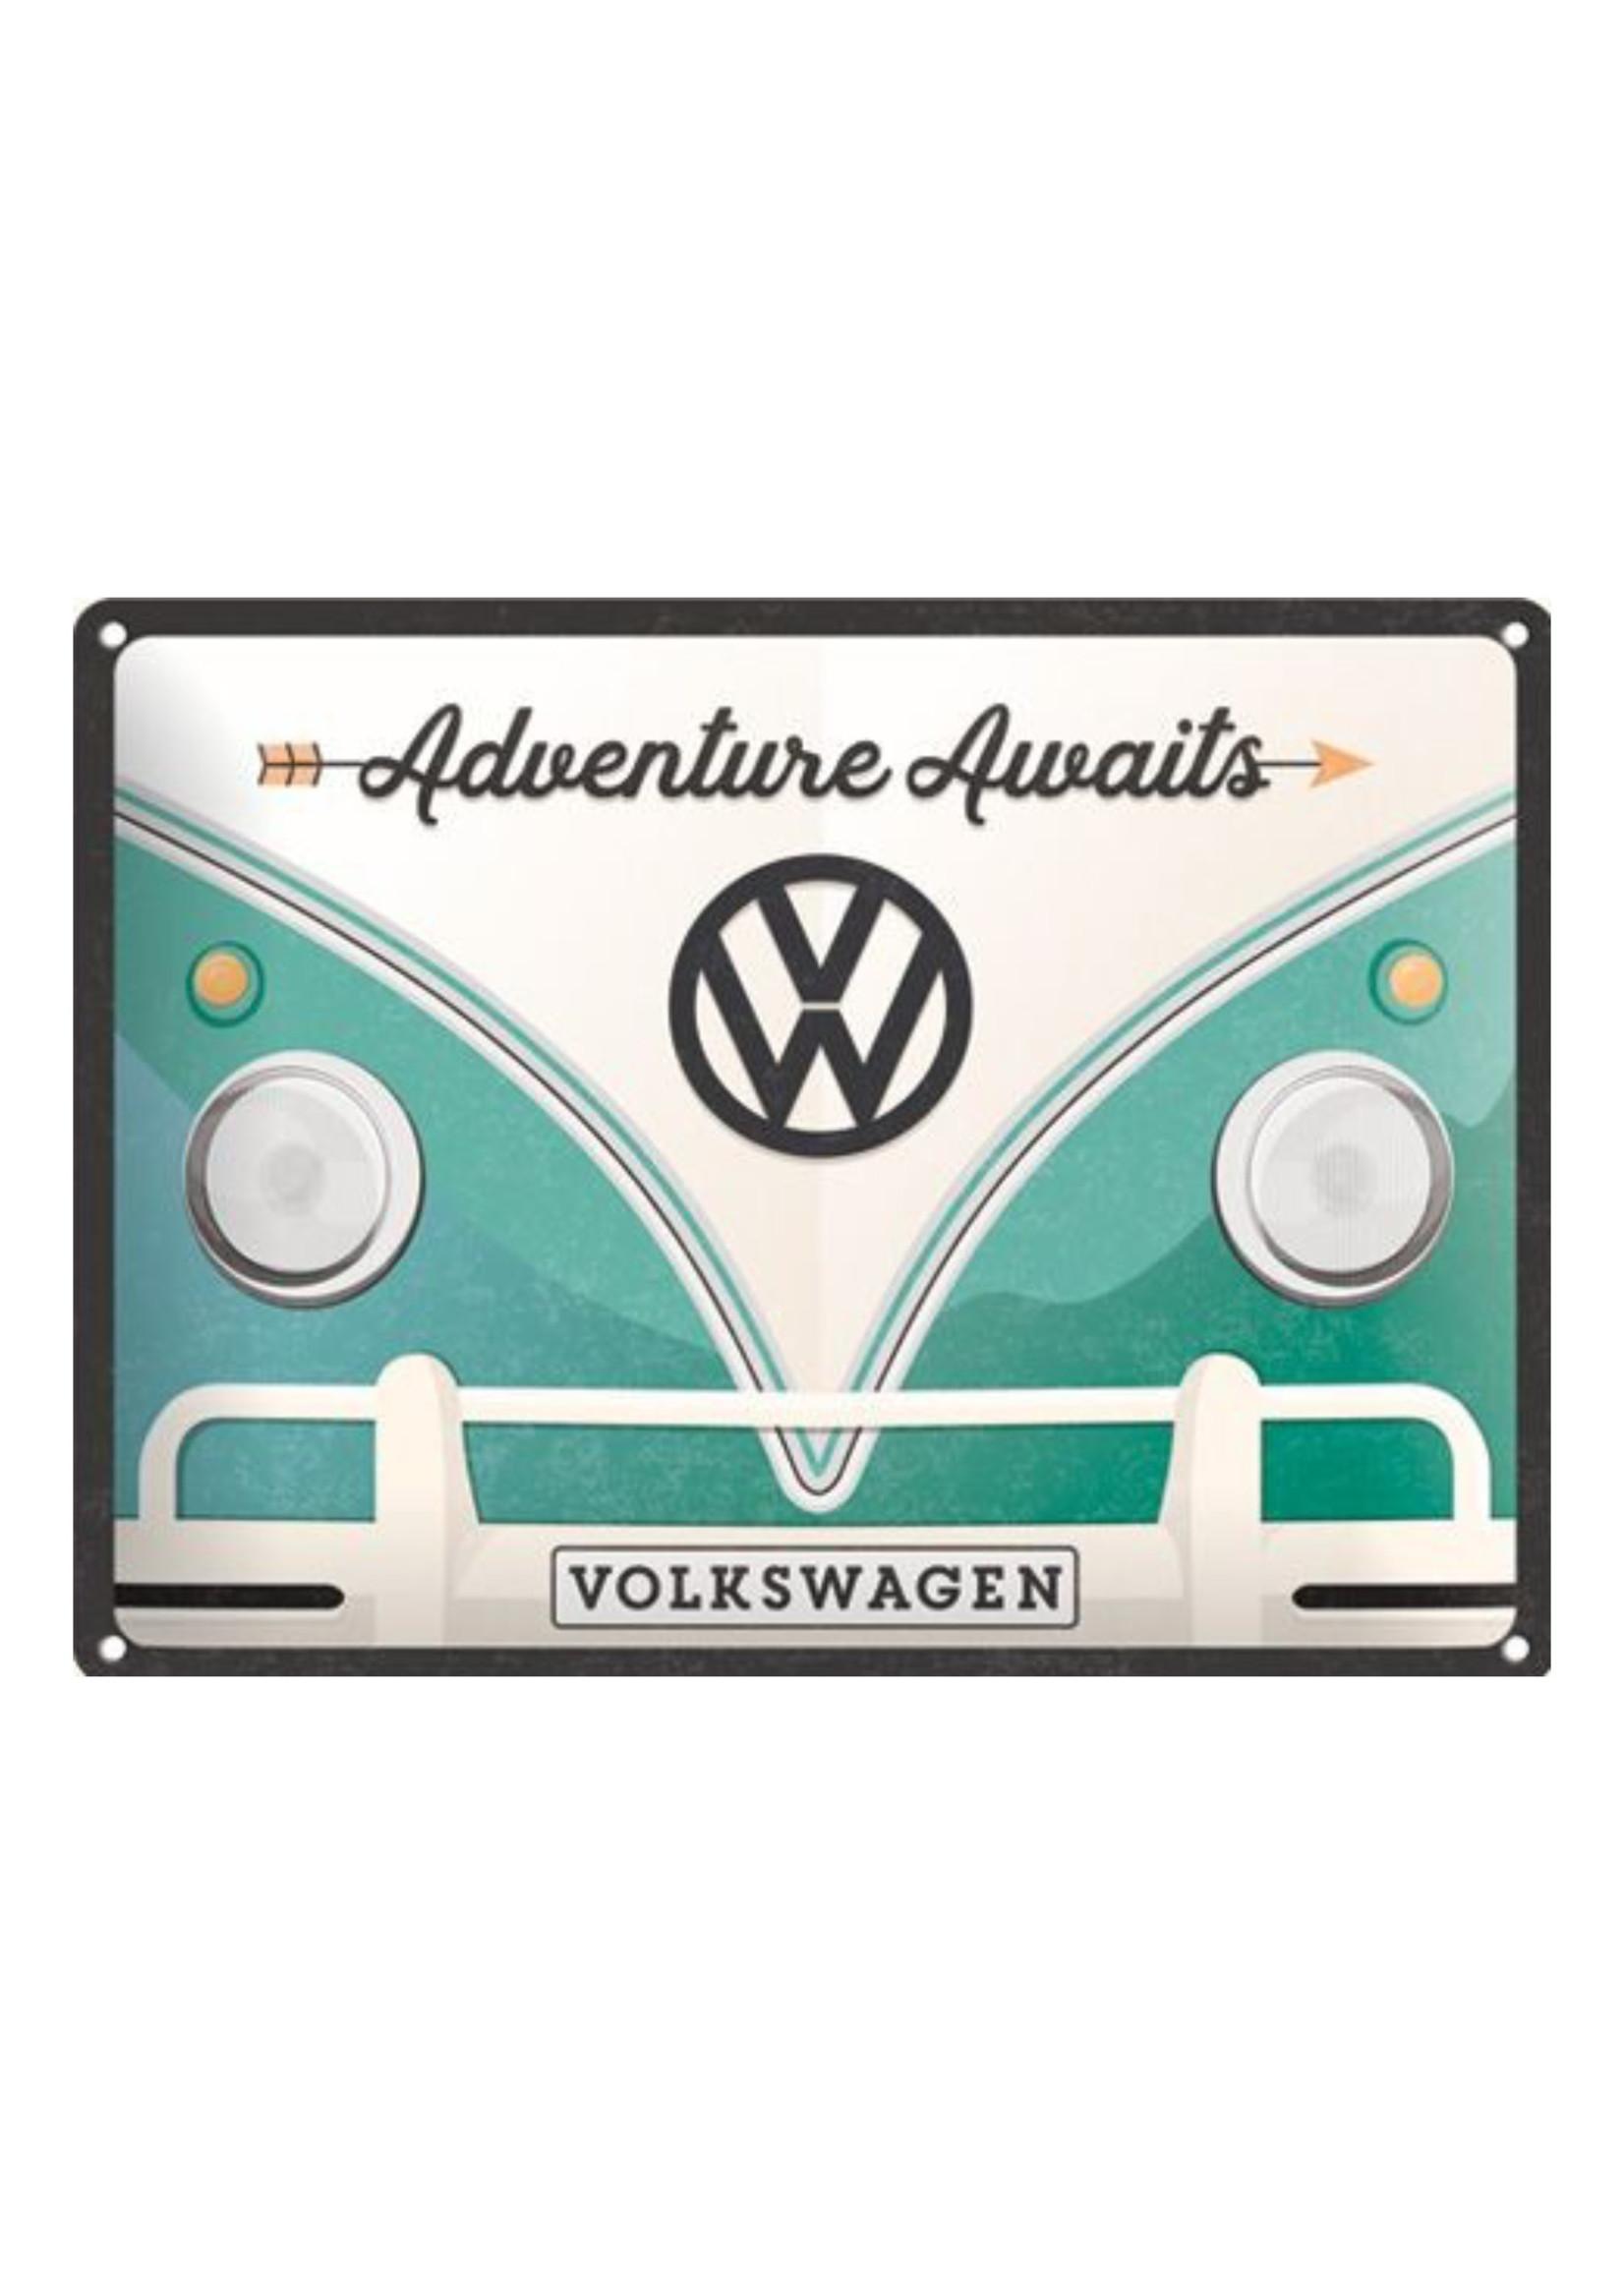 Nostalgic Art Metal wall sign 15 x 20 cm Adventures Awaits VW